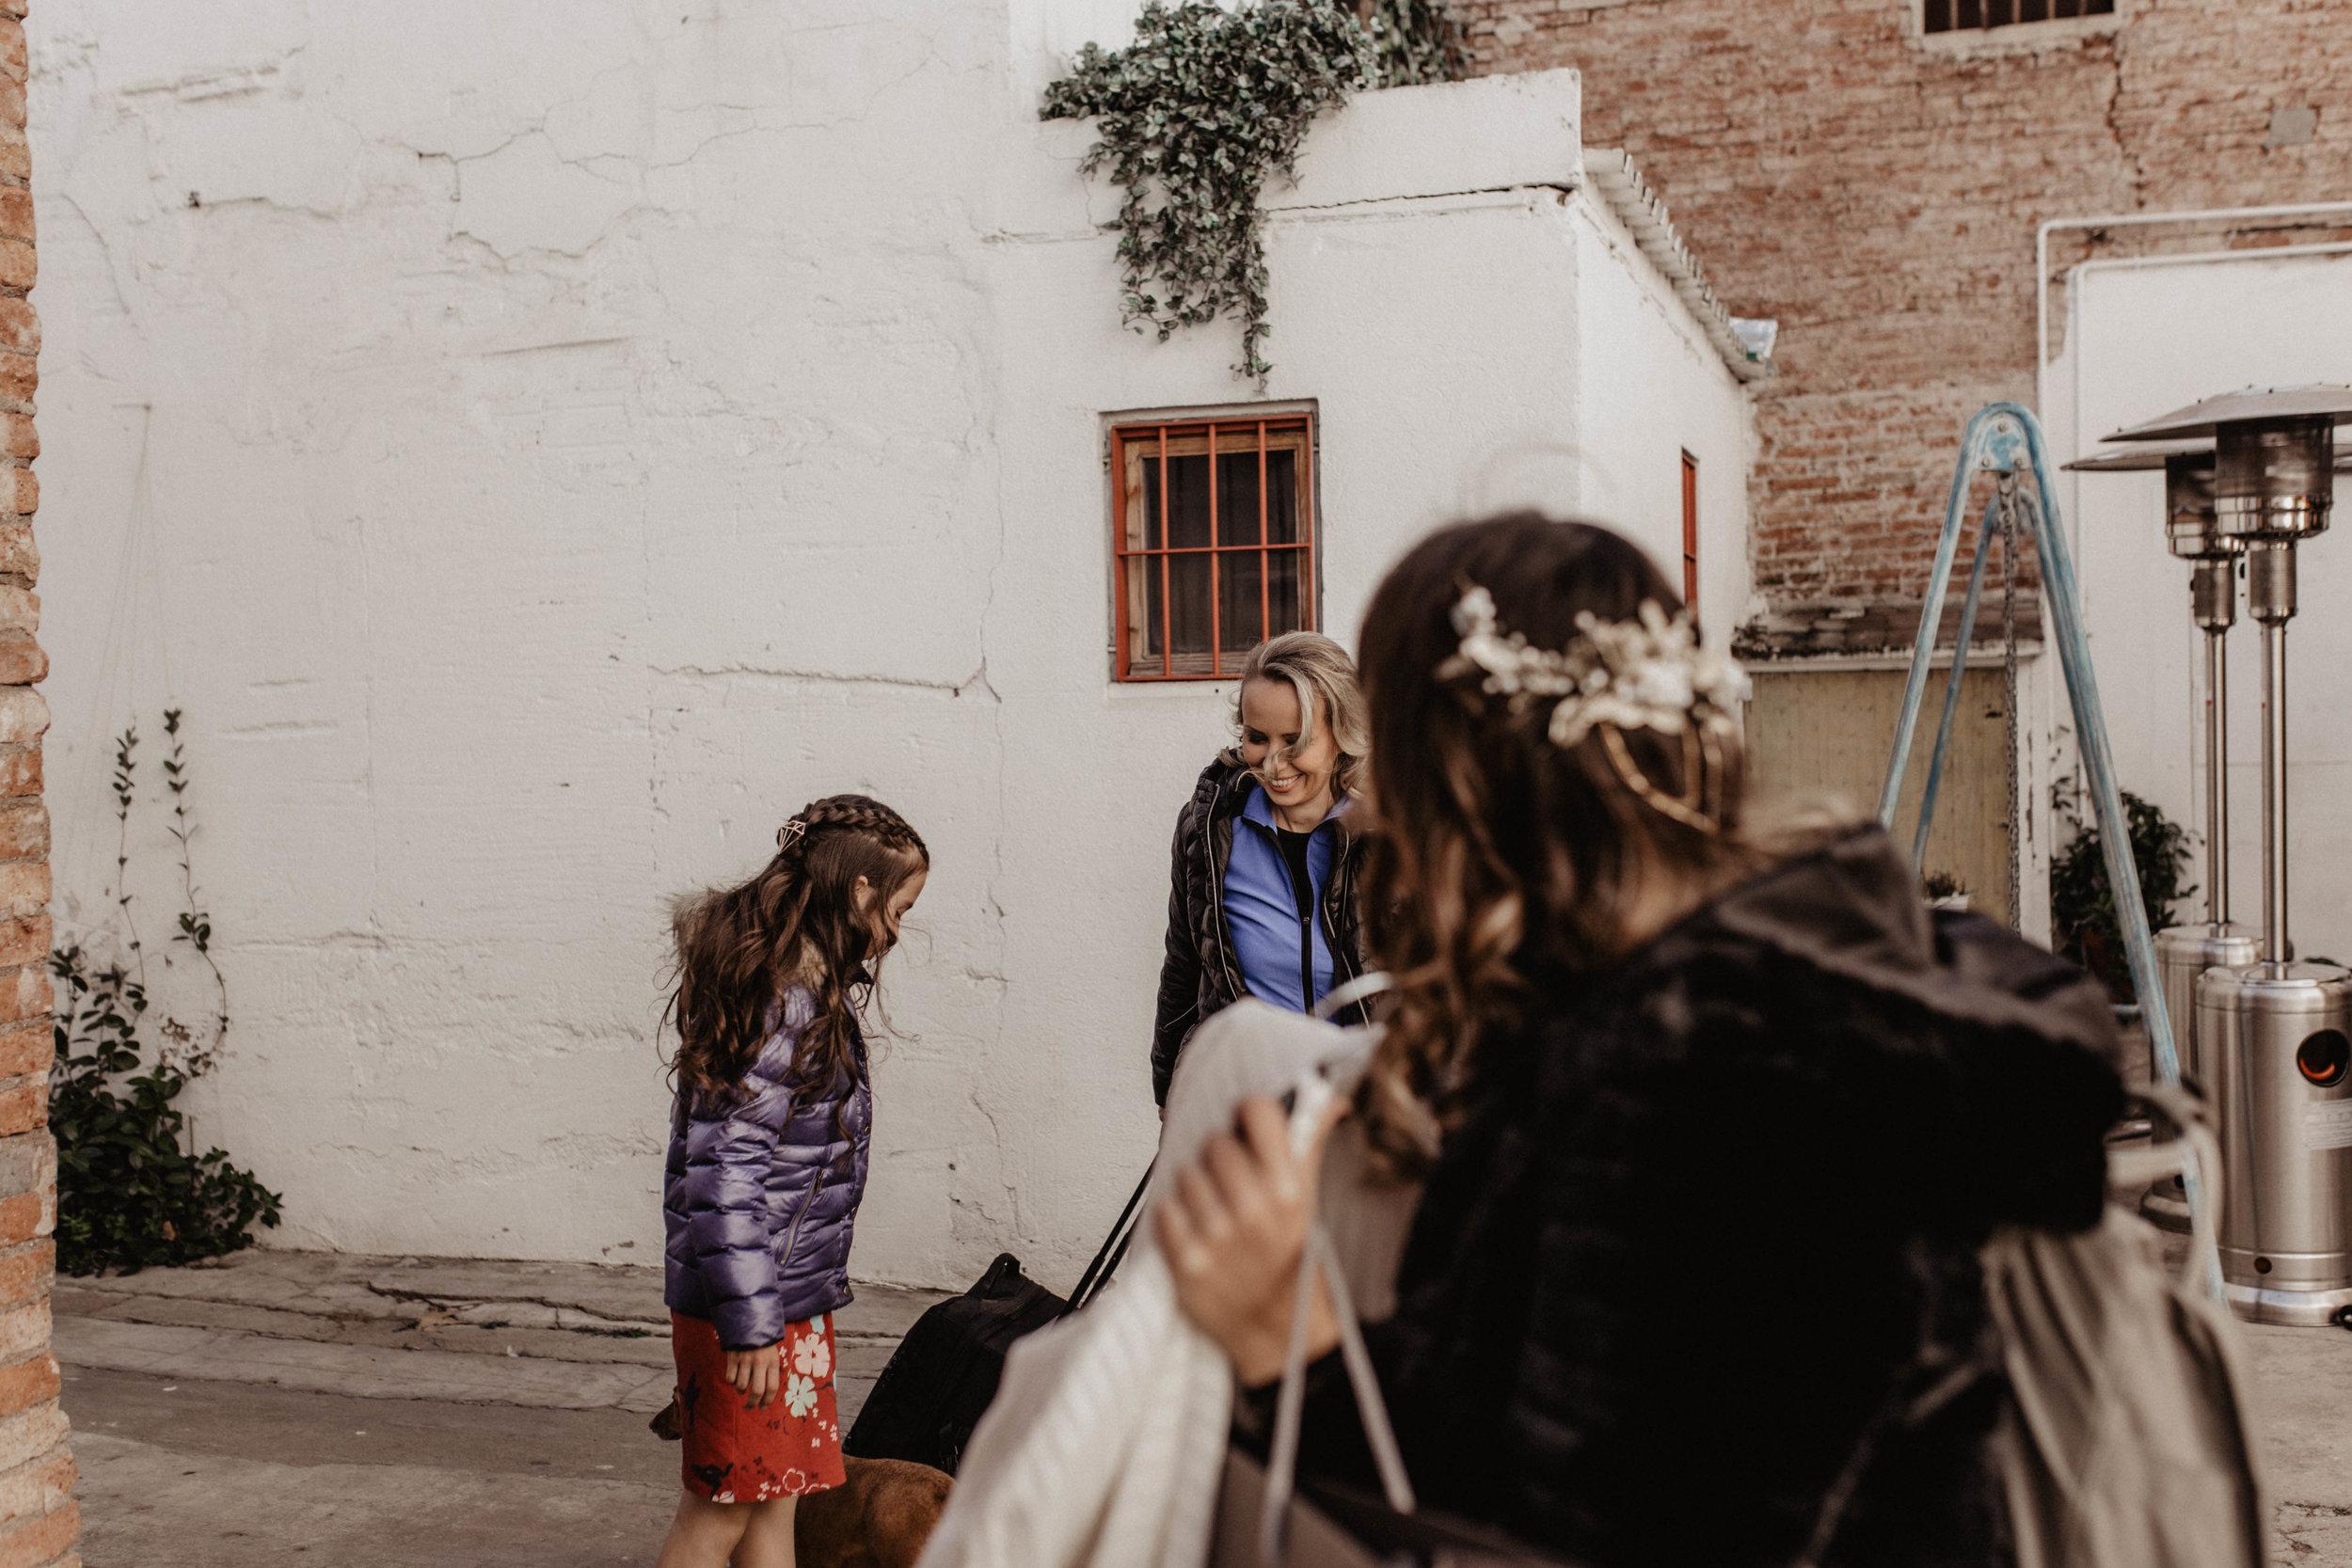 thenortherngirlphotography-photography-weddingphotography-couple-bodasconestilo-bodasenbarcelona-martadavid-79.jpg